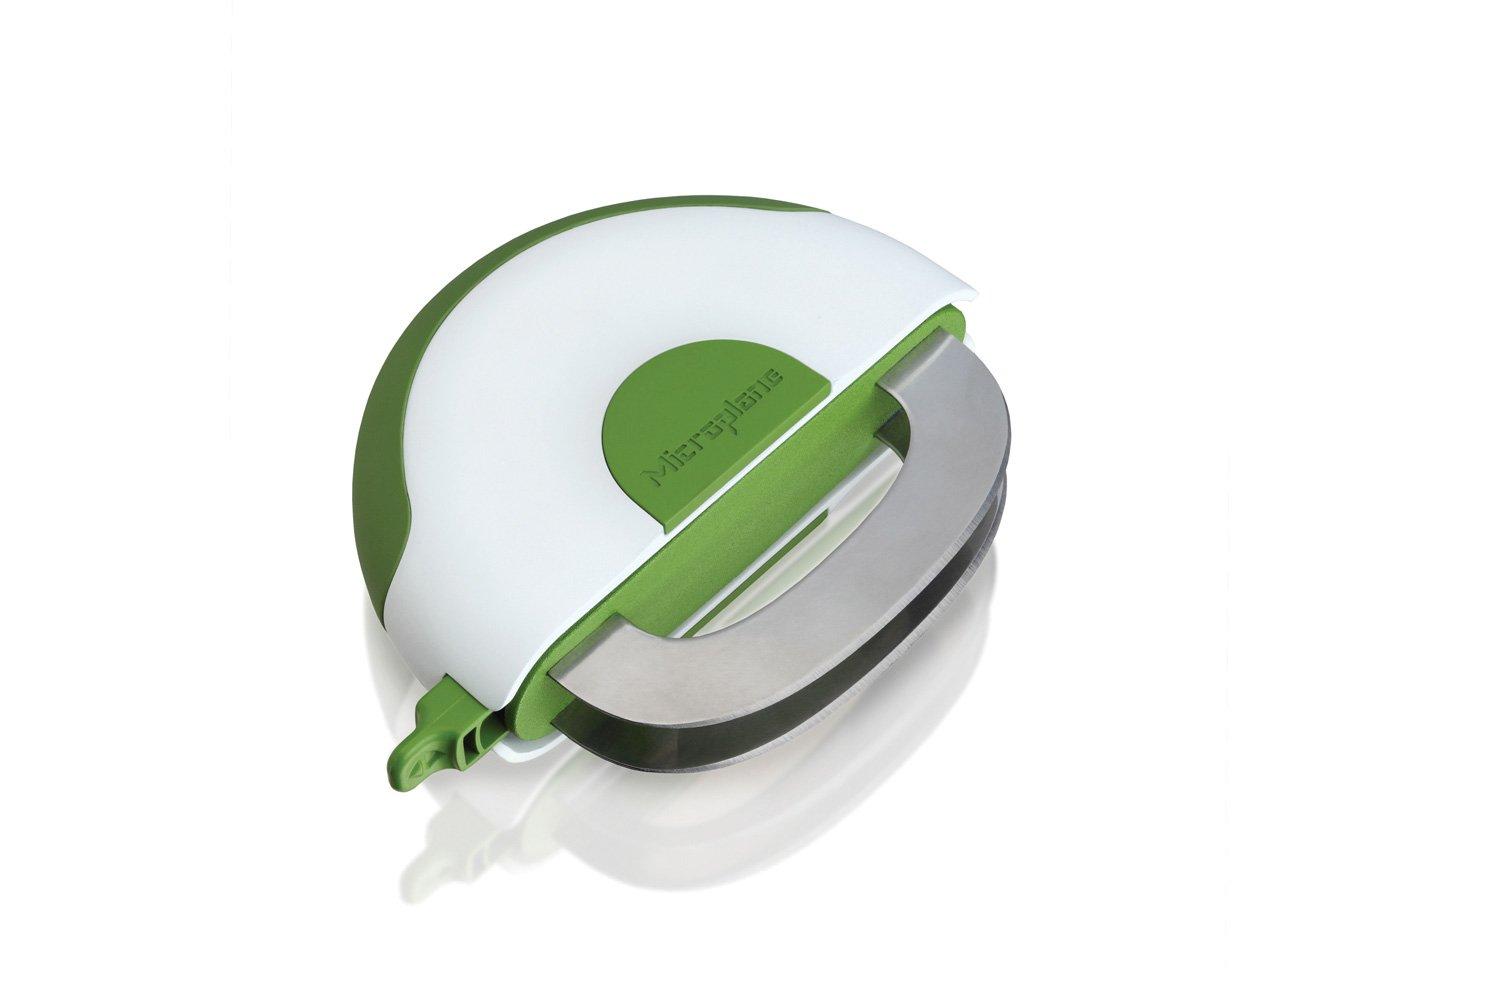 Нож для нарезки Easy Prep Microplane салатов, трав и зелени, белый